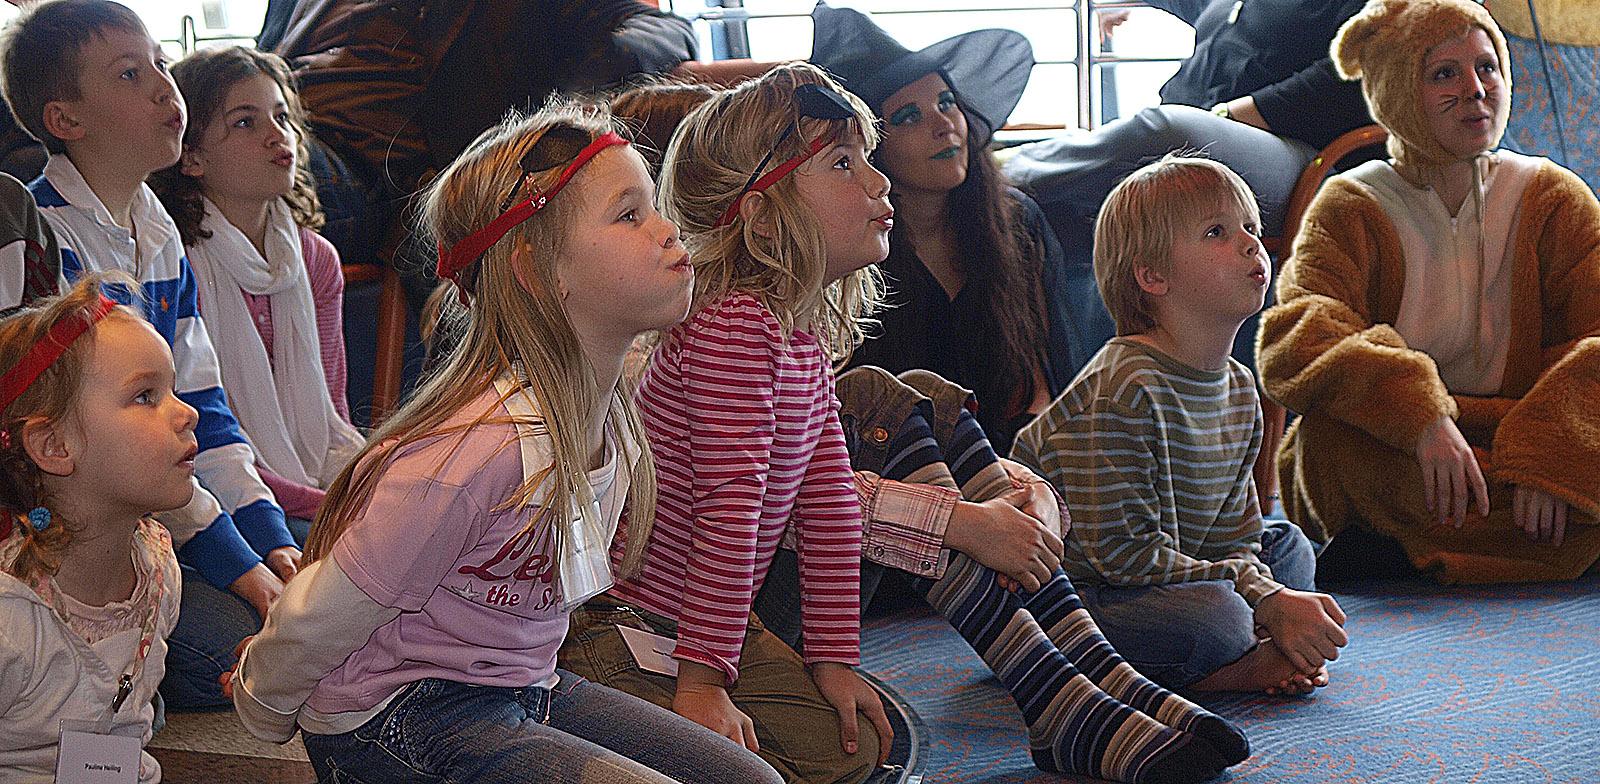 Kinderanimation auf der TT Line. Foto: Hilke Maunder